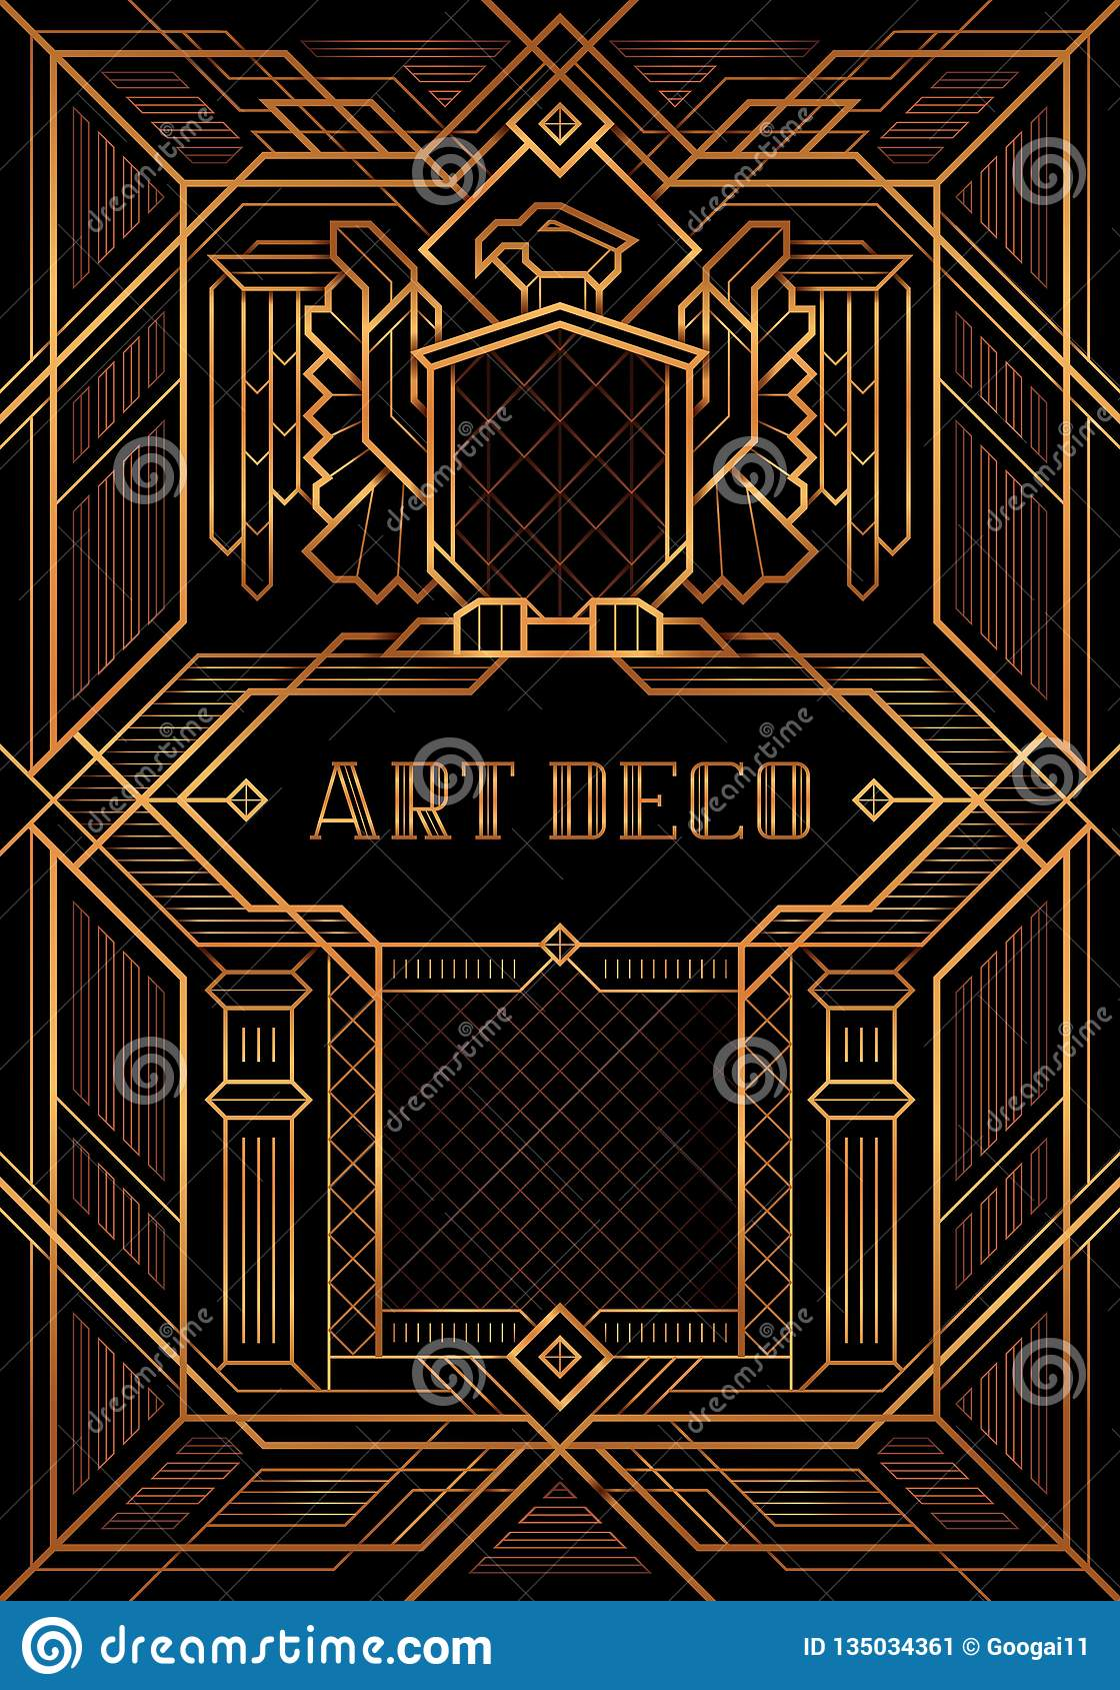 Der große Artvektor Gatsby Deco